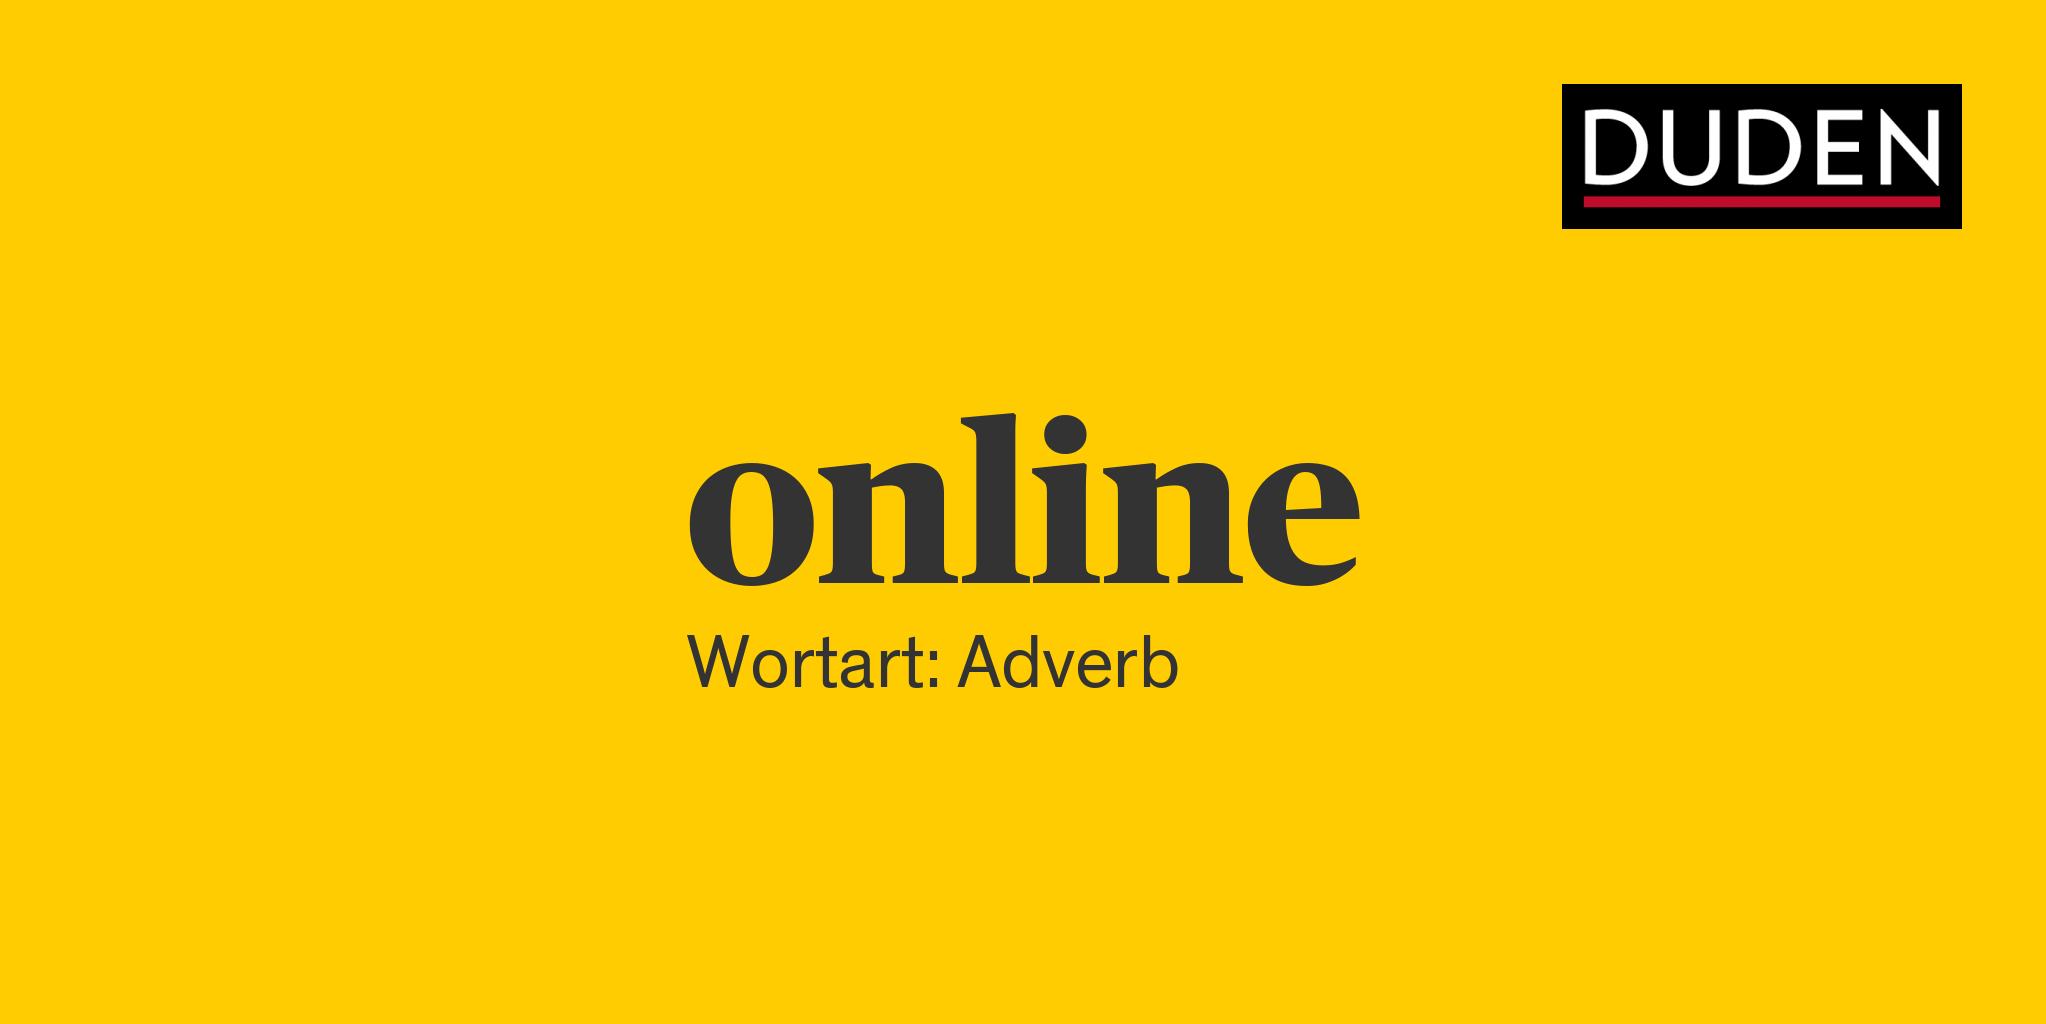 Duden Online Rechtschreibung Bedeutung Definition Herkunft